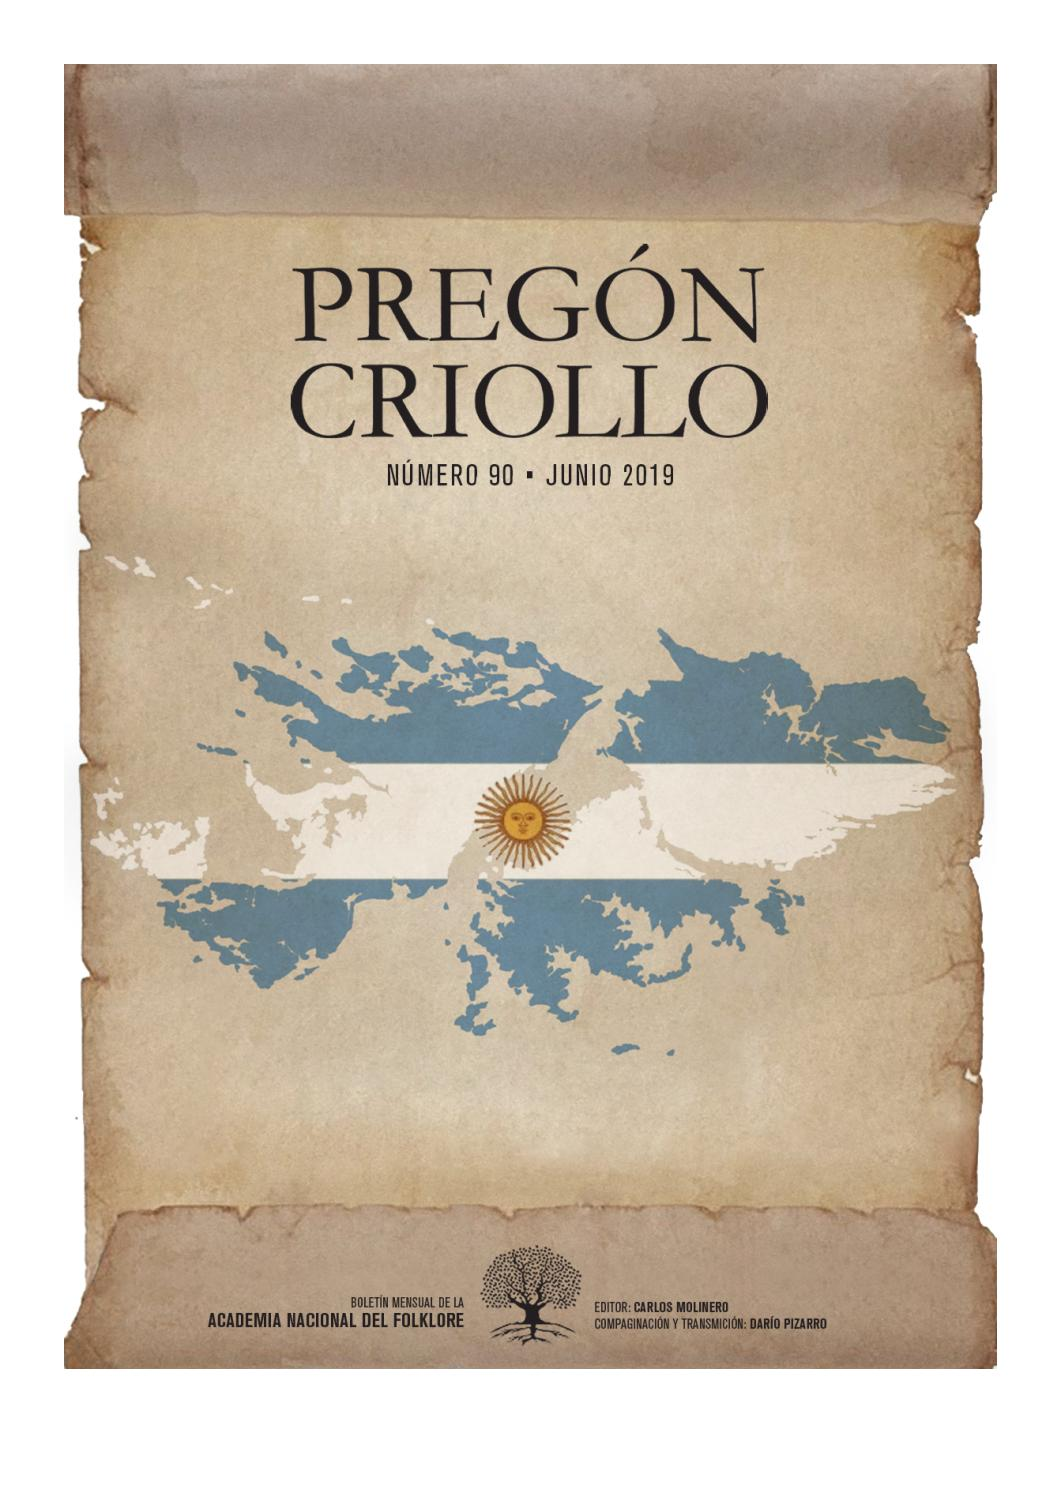 a98b132e9 Pregón Criollo Nº 90 - Junio 2019 by Academia Nacional del Folklore ...